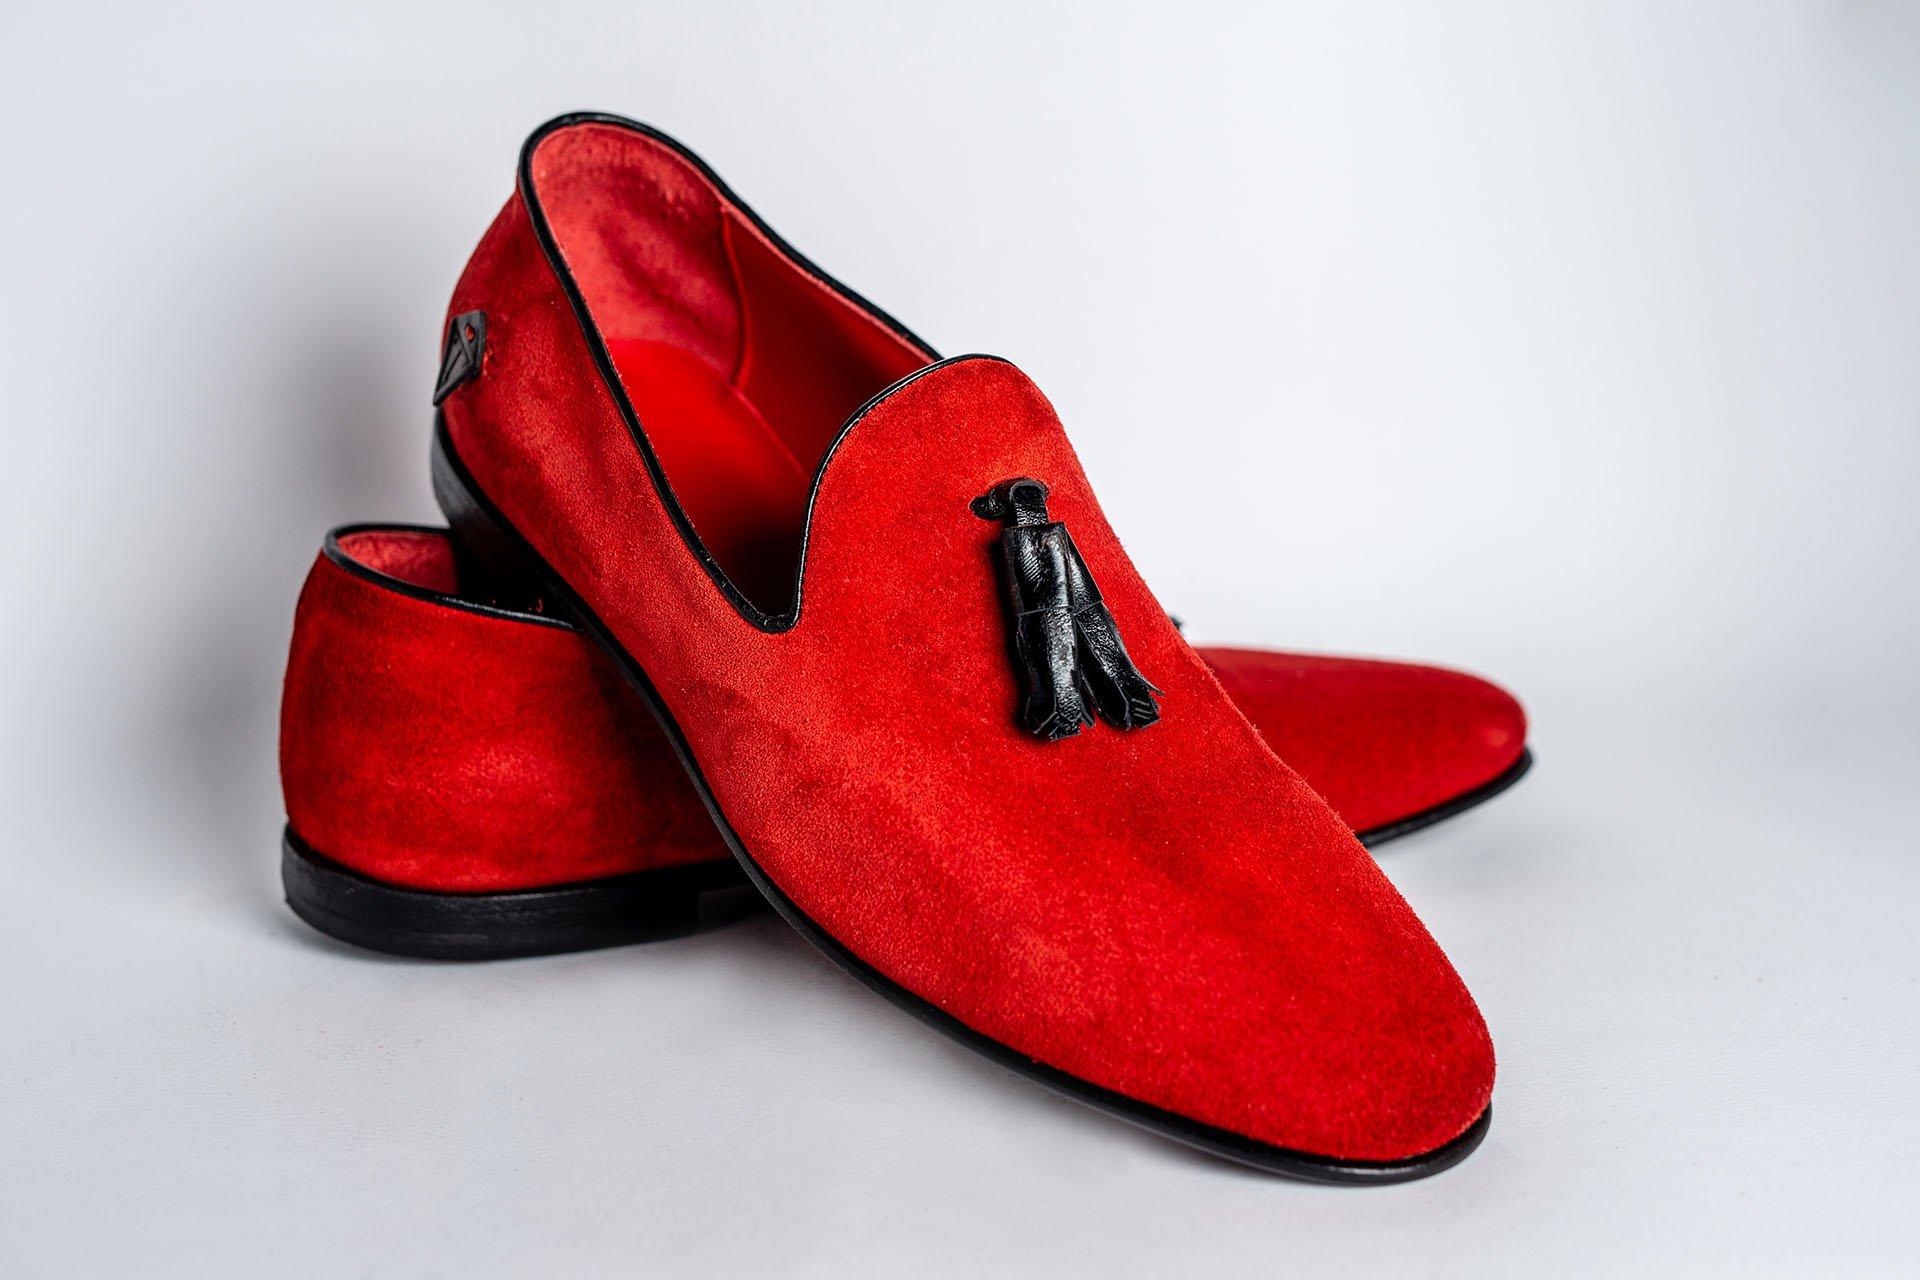 Pantofola-camoscio-rosso-1